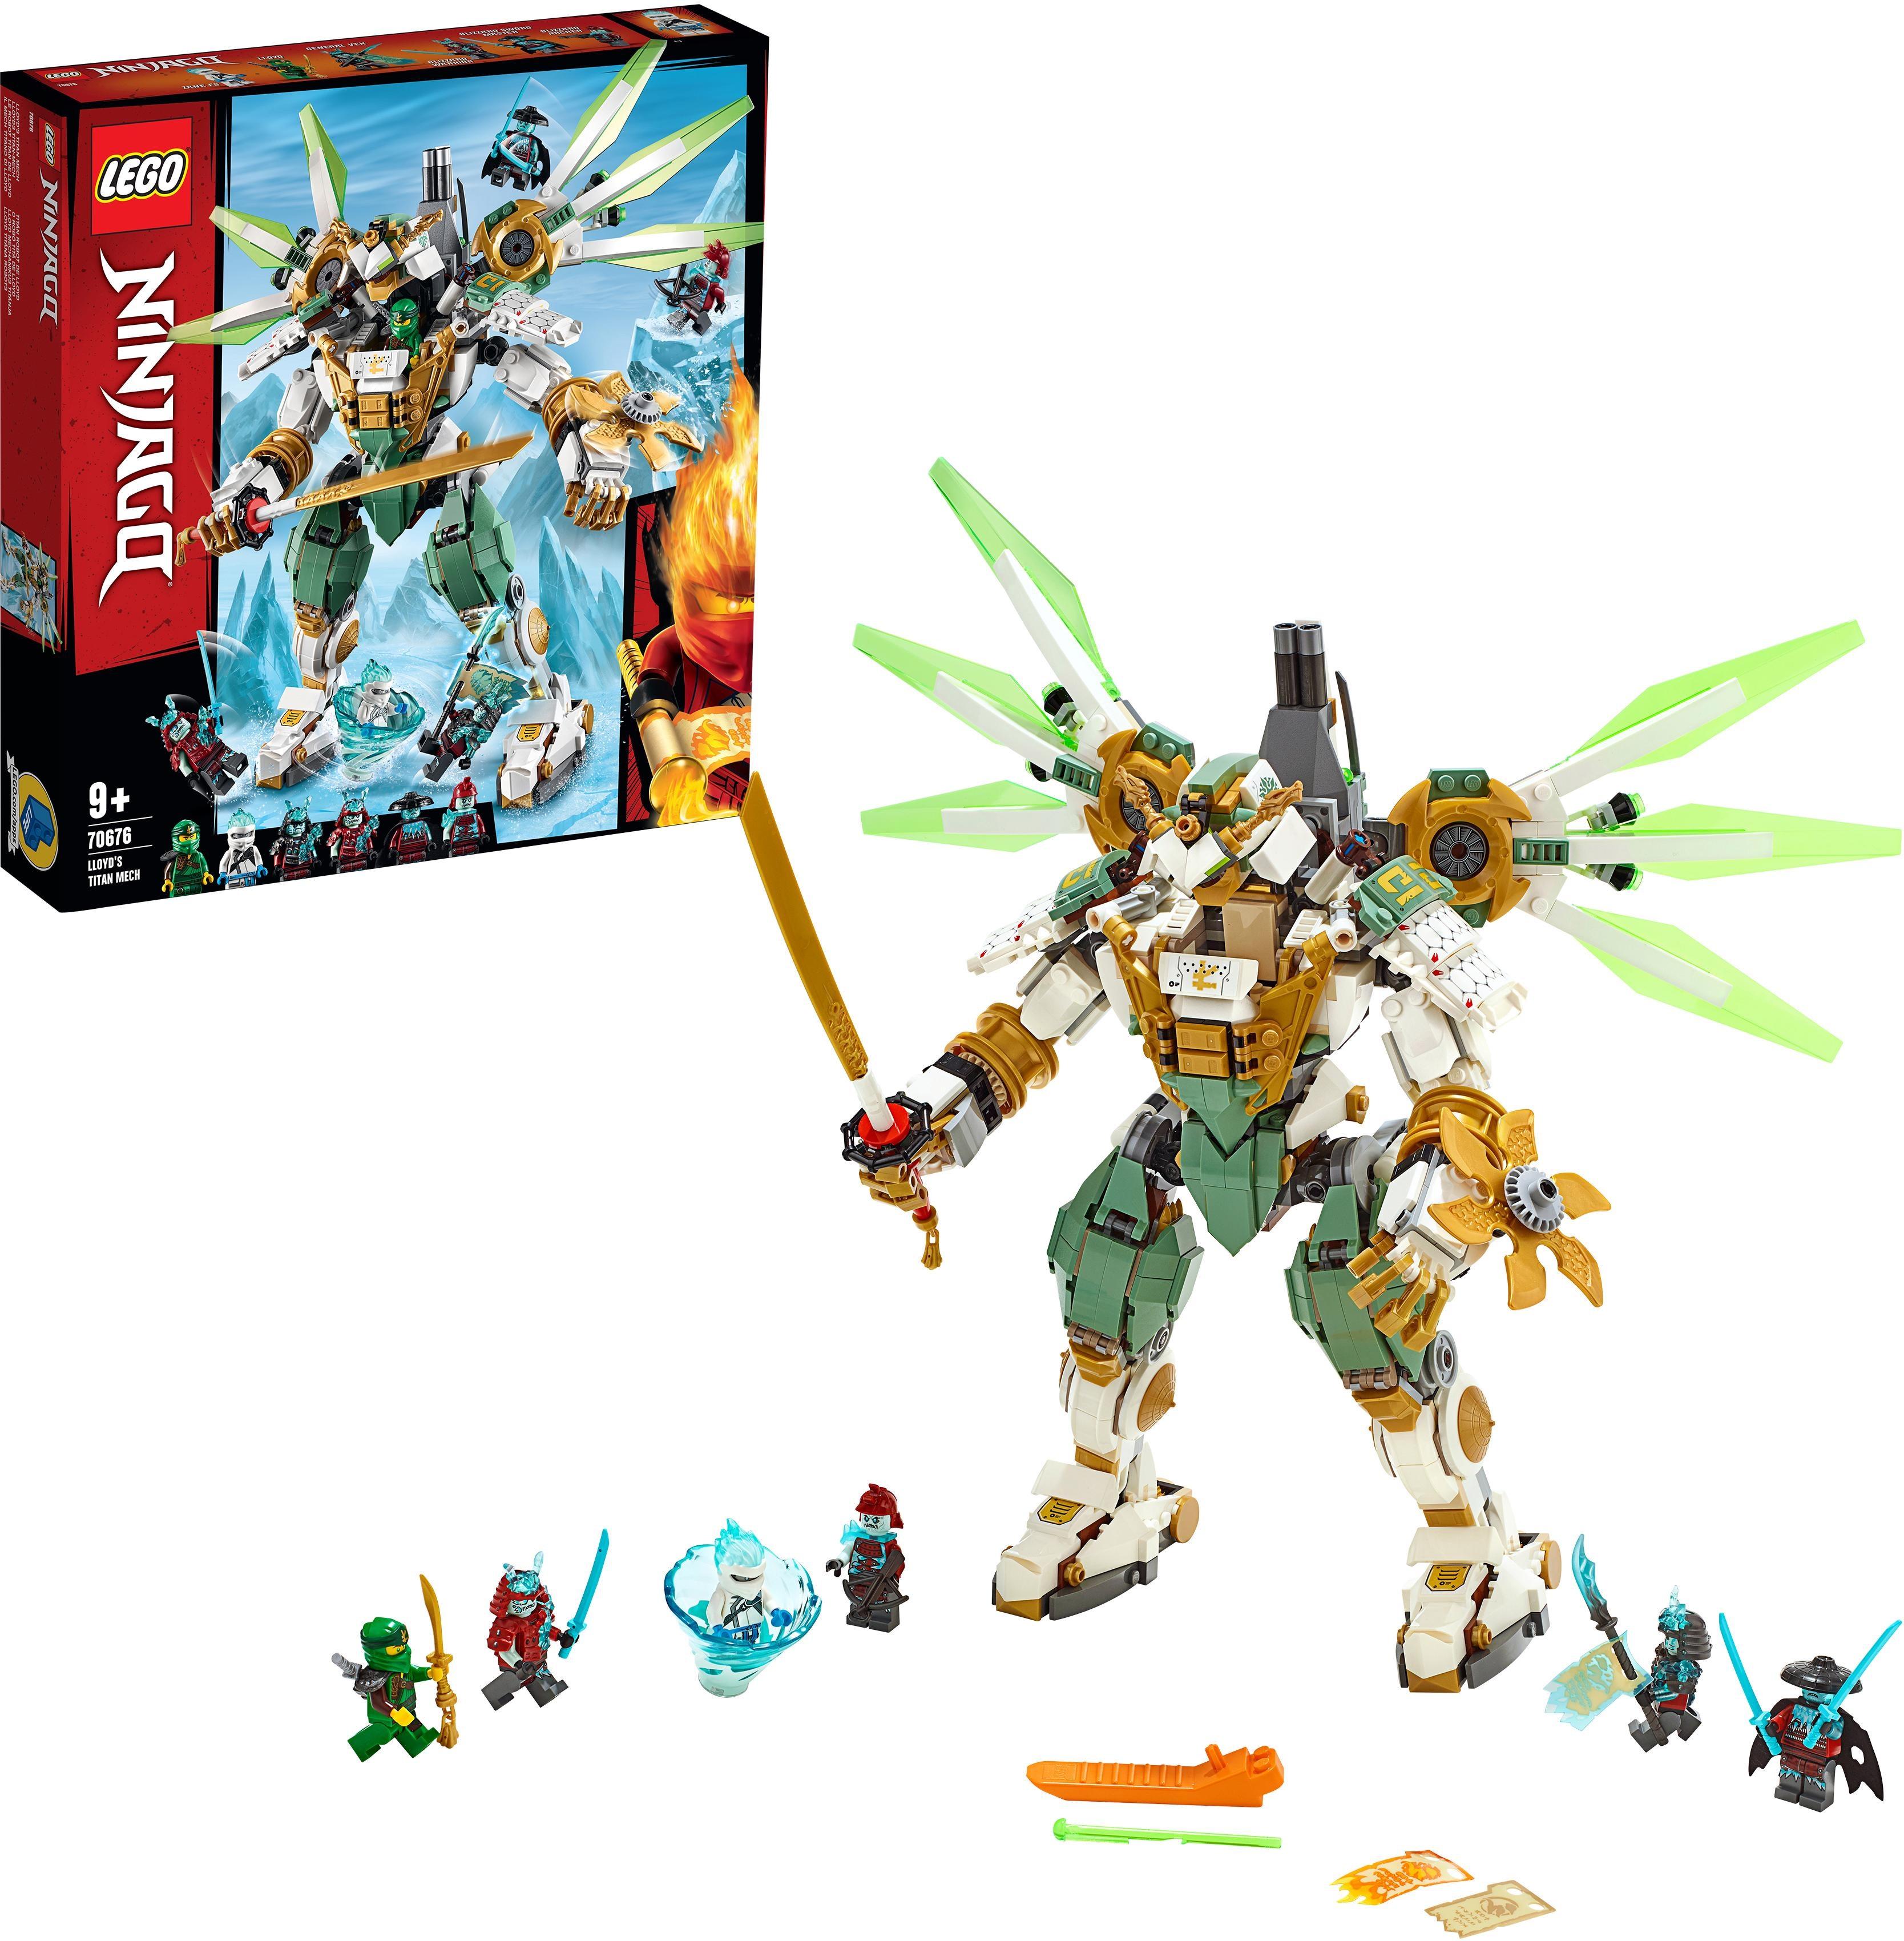 LEGO Konstruktionsspielsteine ´´Lloyds Titan-Mech (70676) LEGO NINJAGO´´ (876-tlg) Preisvergleich